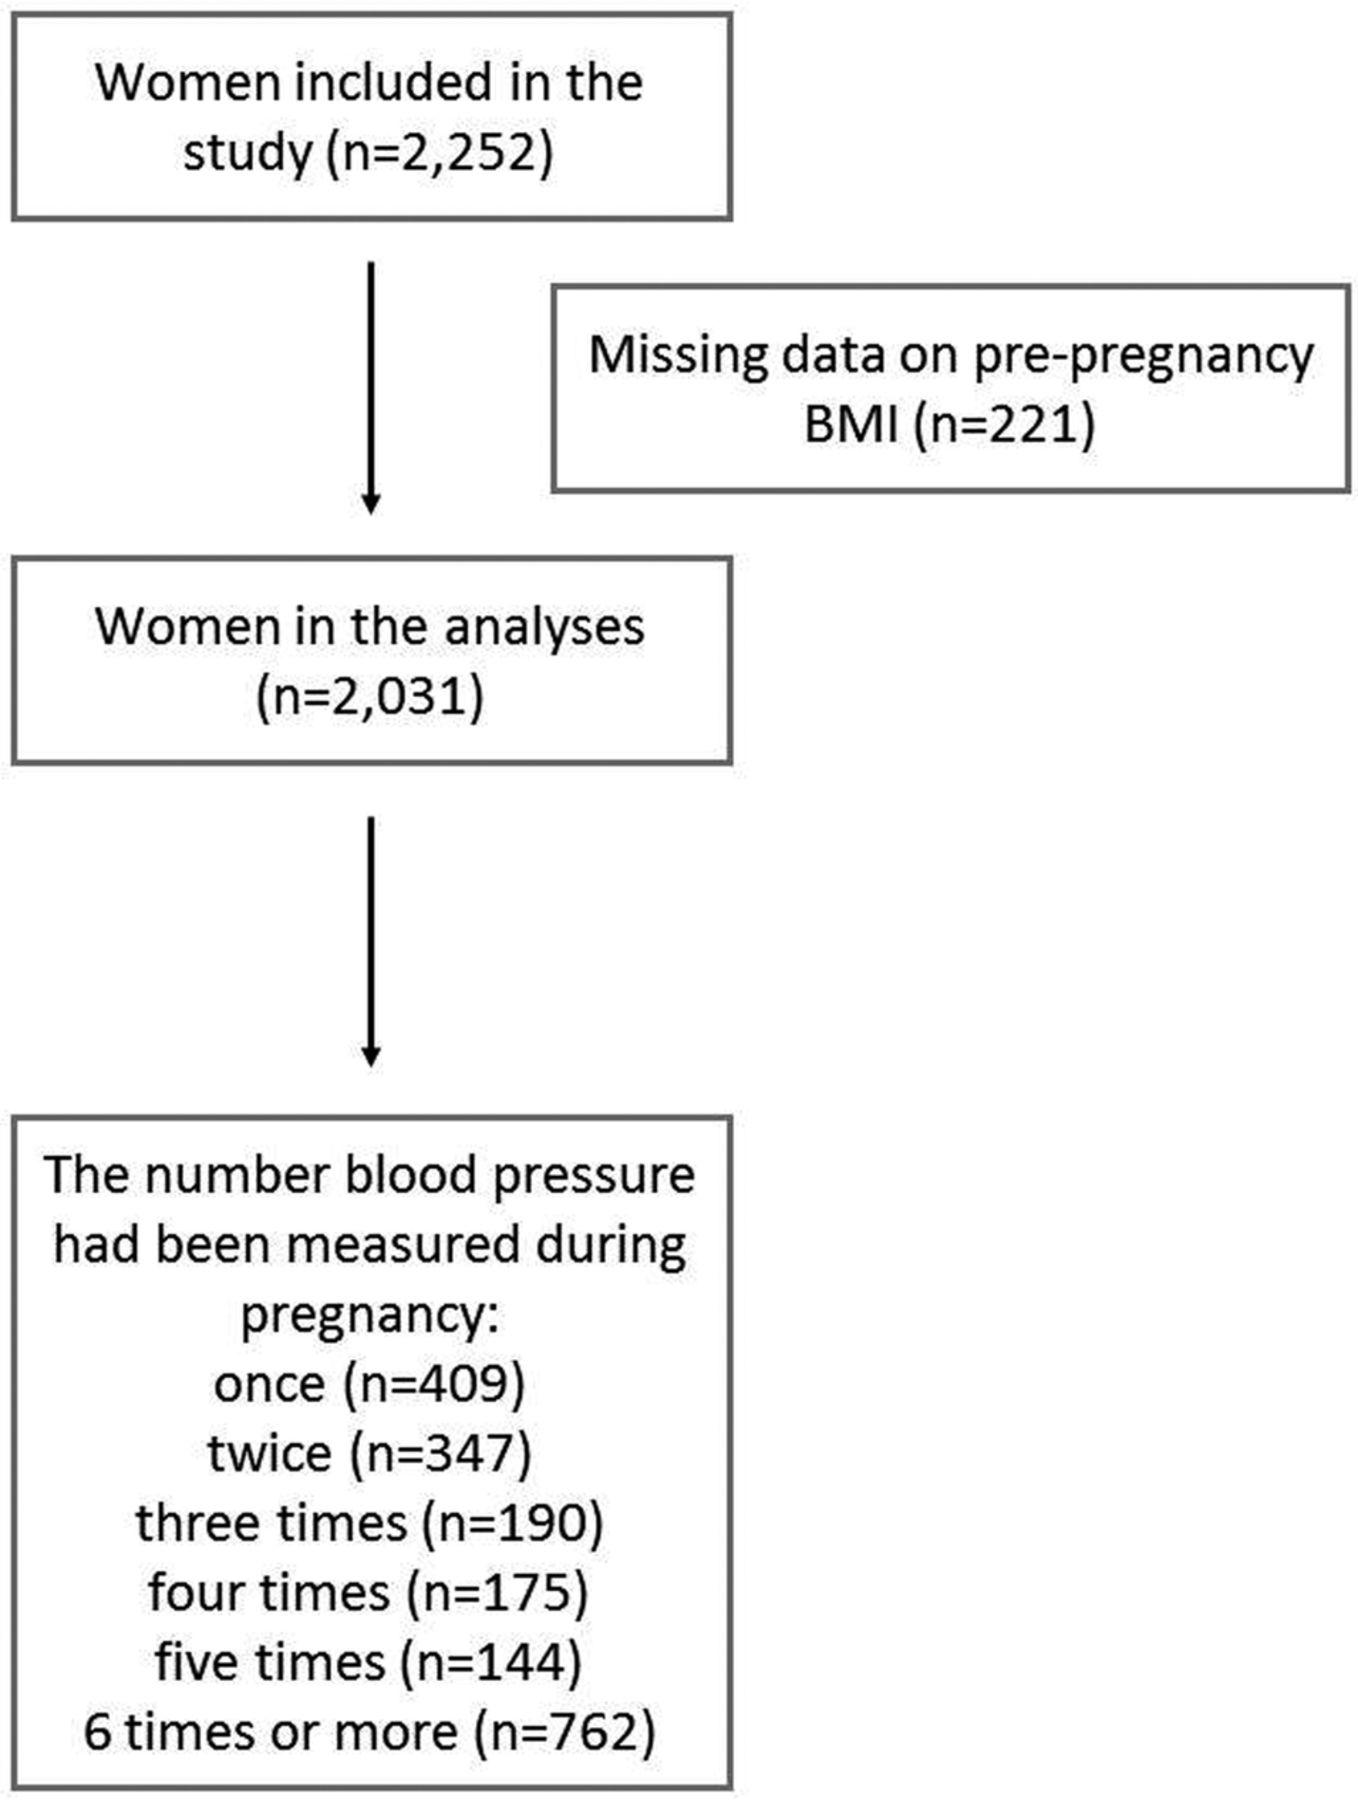 Does Pre Pregnancy Bmi Determine Blood Pressure During Pregnancy A